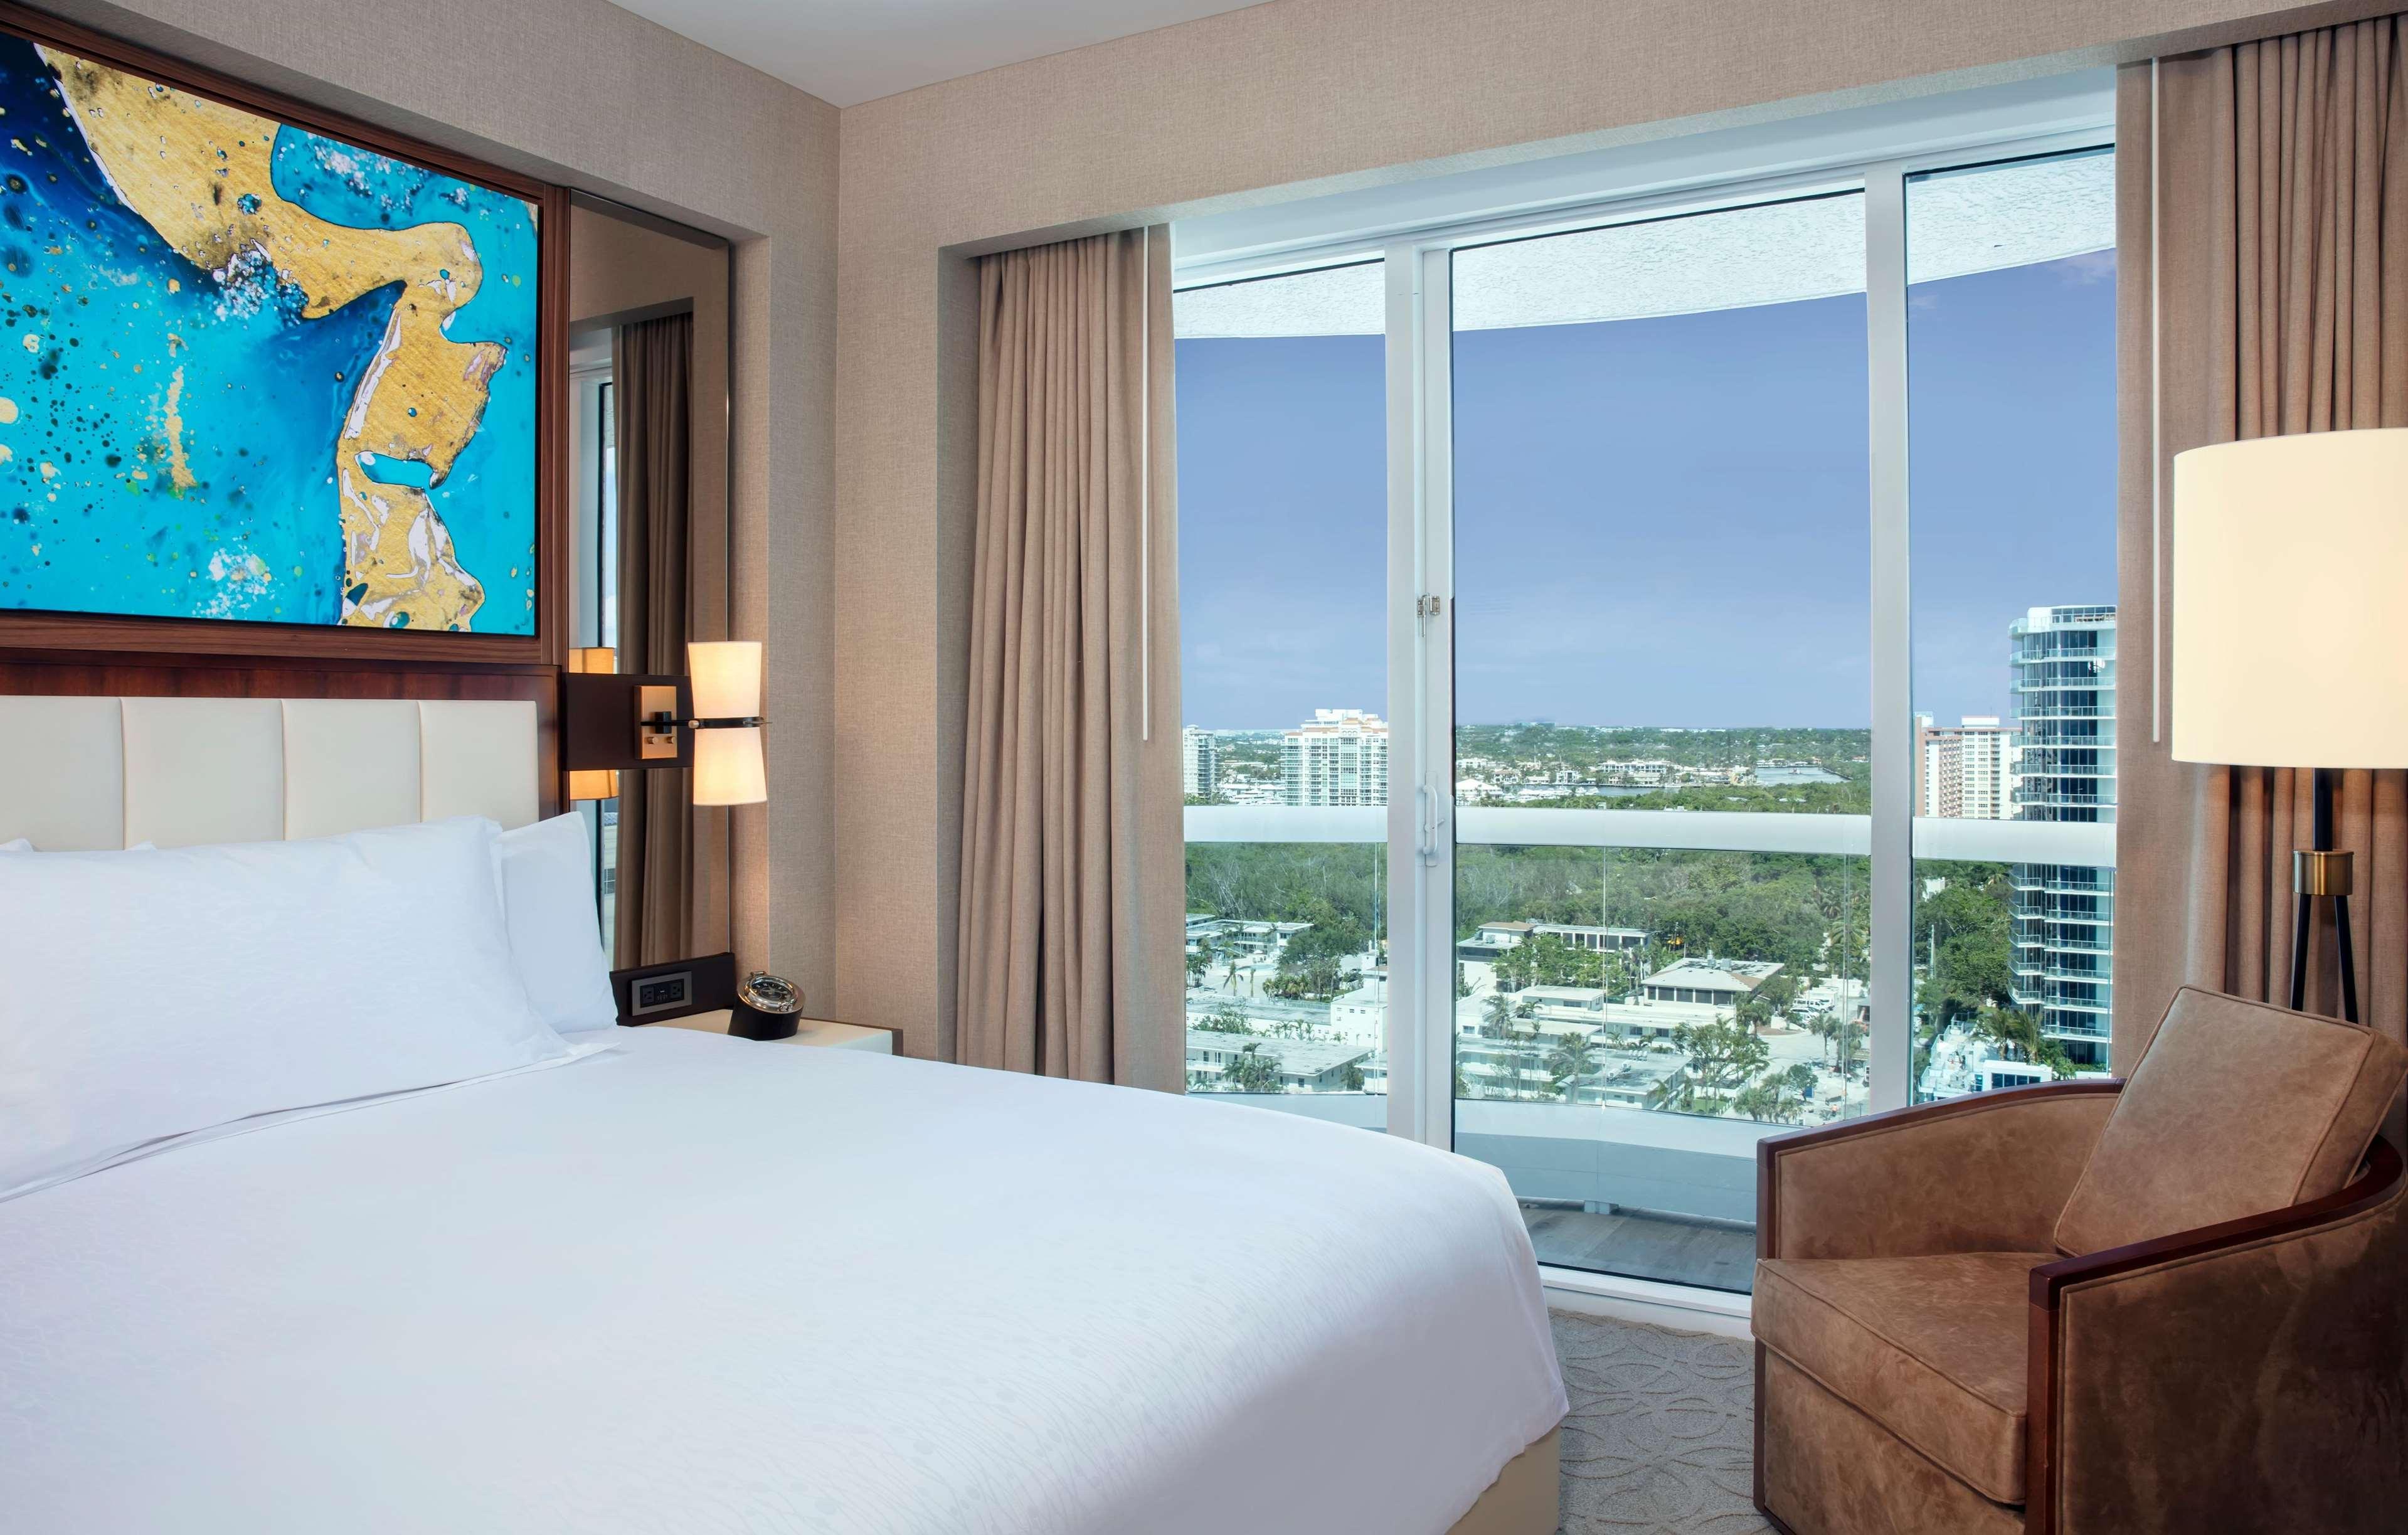 Conrad Fort Lauderdale Beach image 7